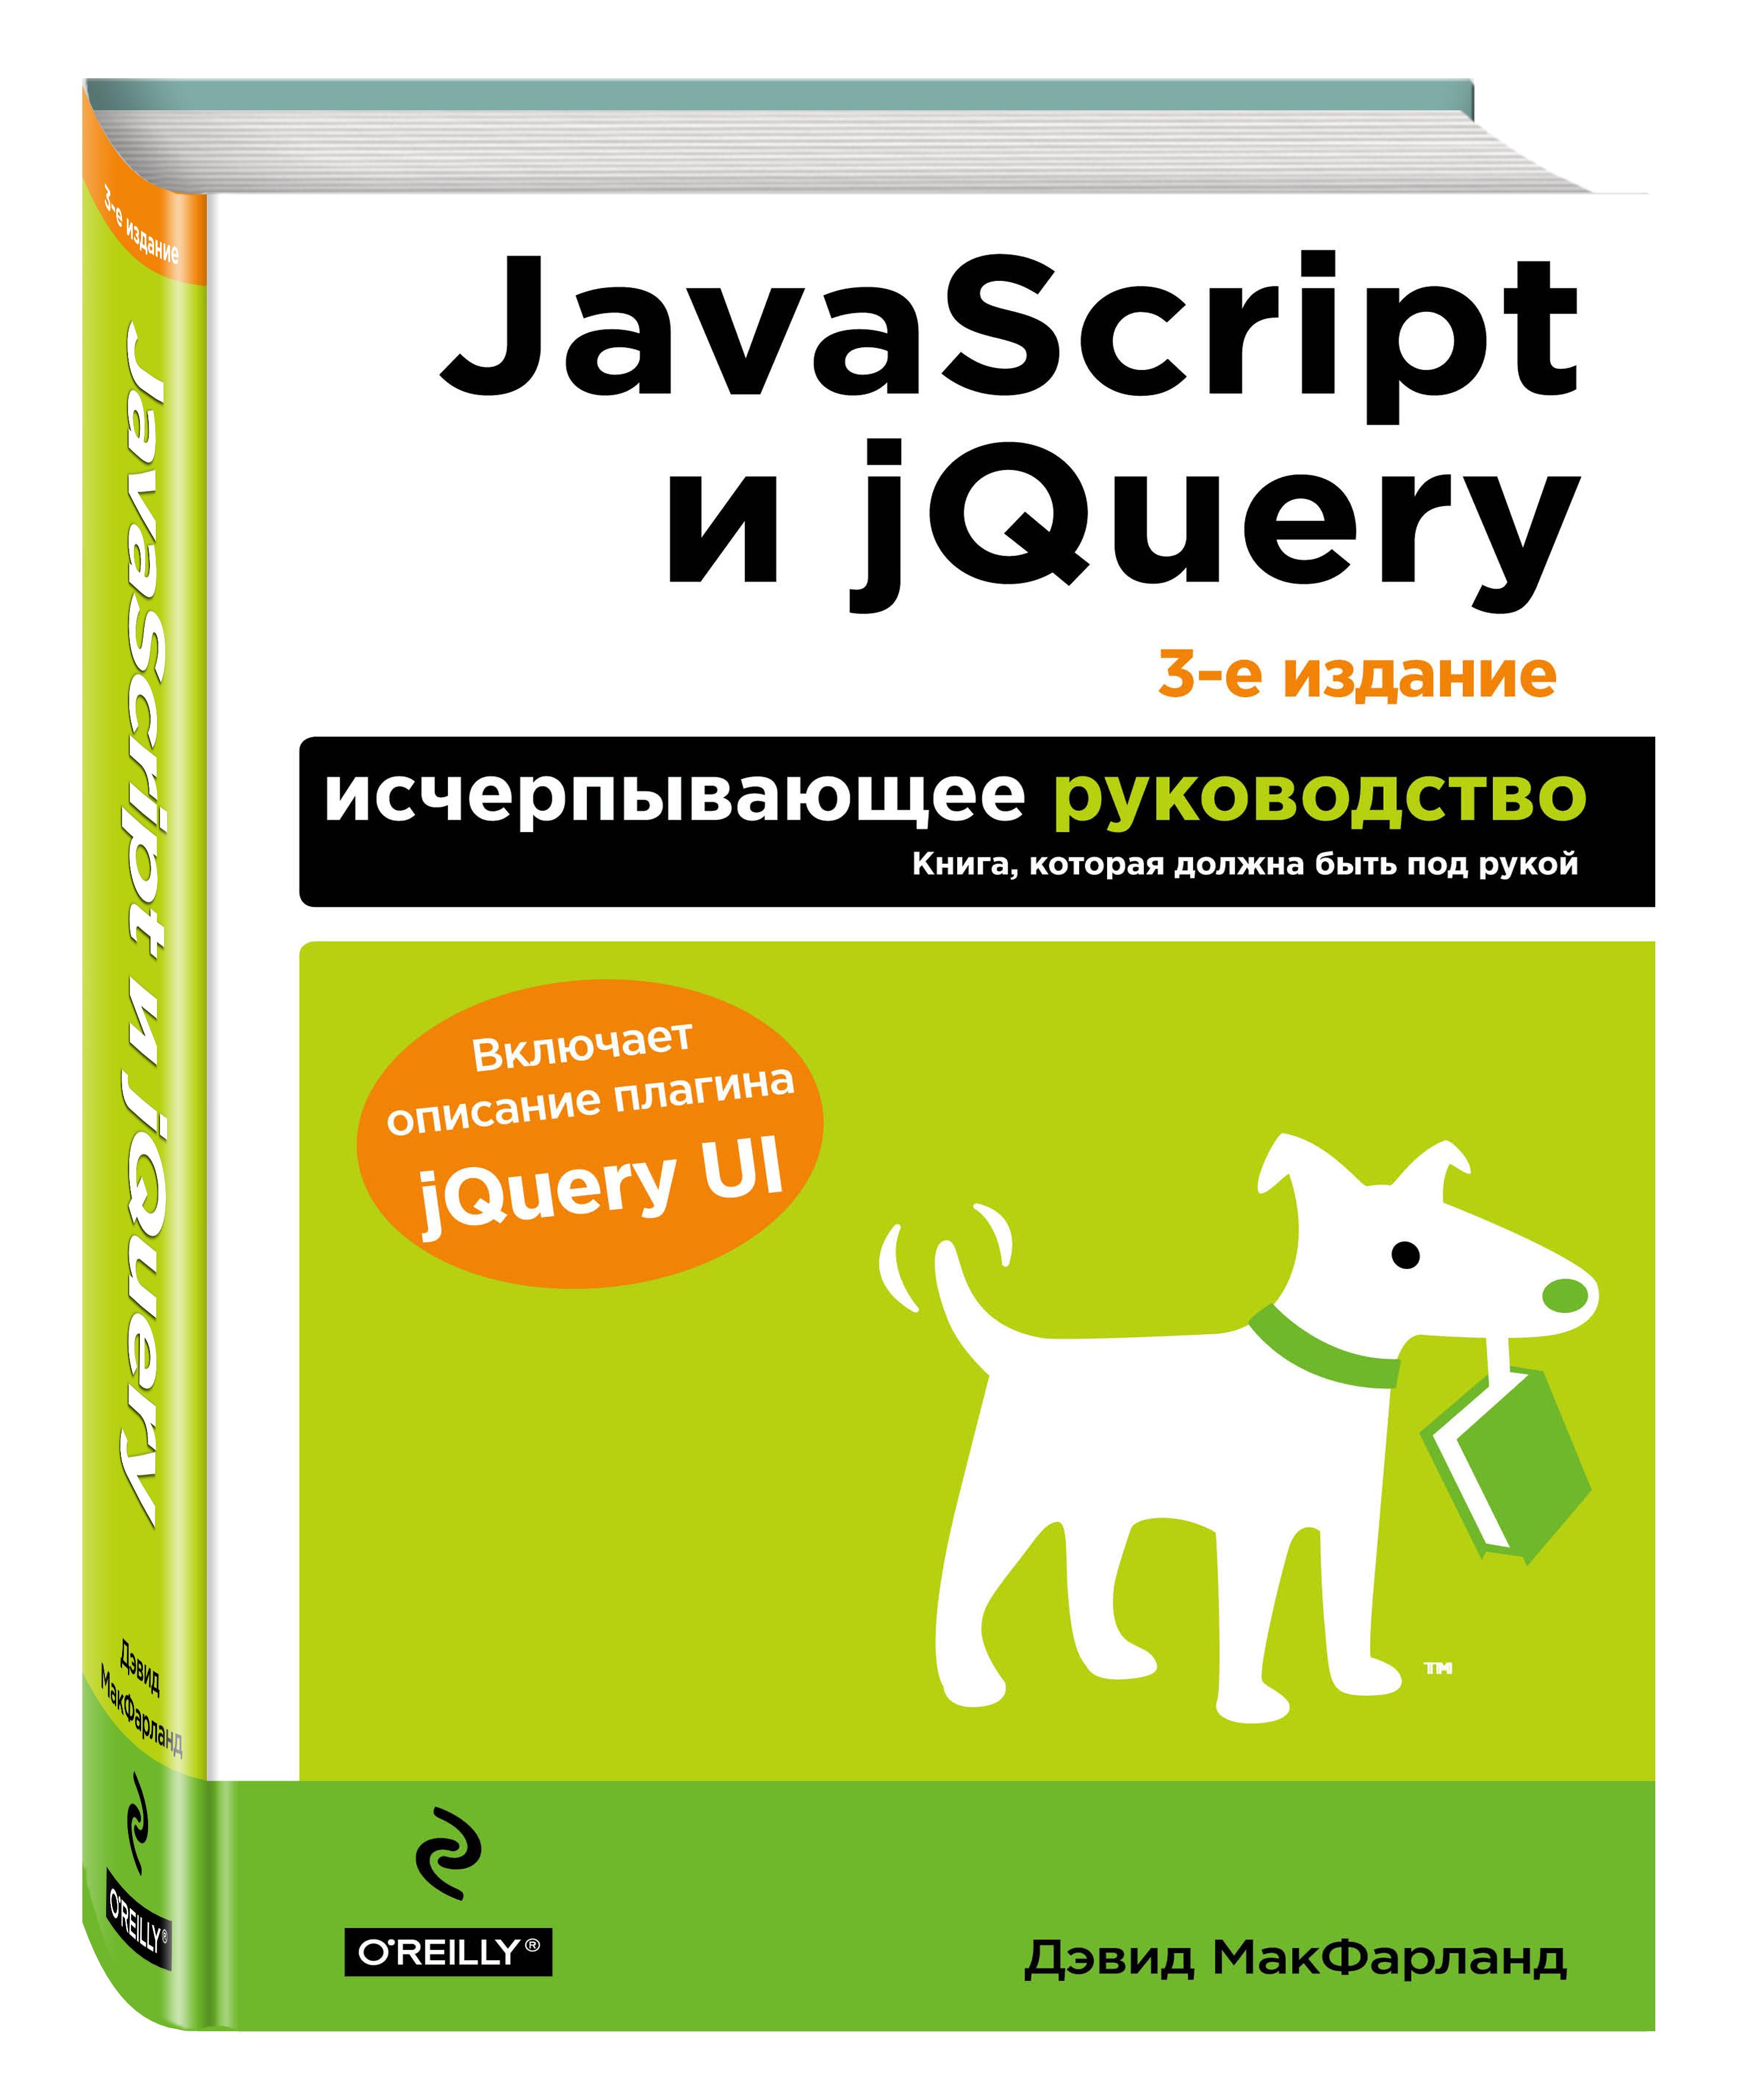 Макфарланд Д. JavaScript и jQuery. Исчерпывающее руководство. 3-е издание sql полное руководство 3 издание